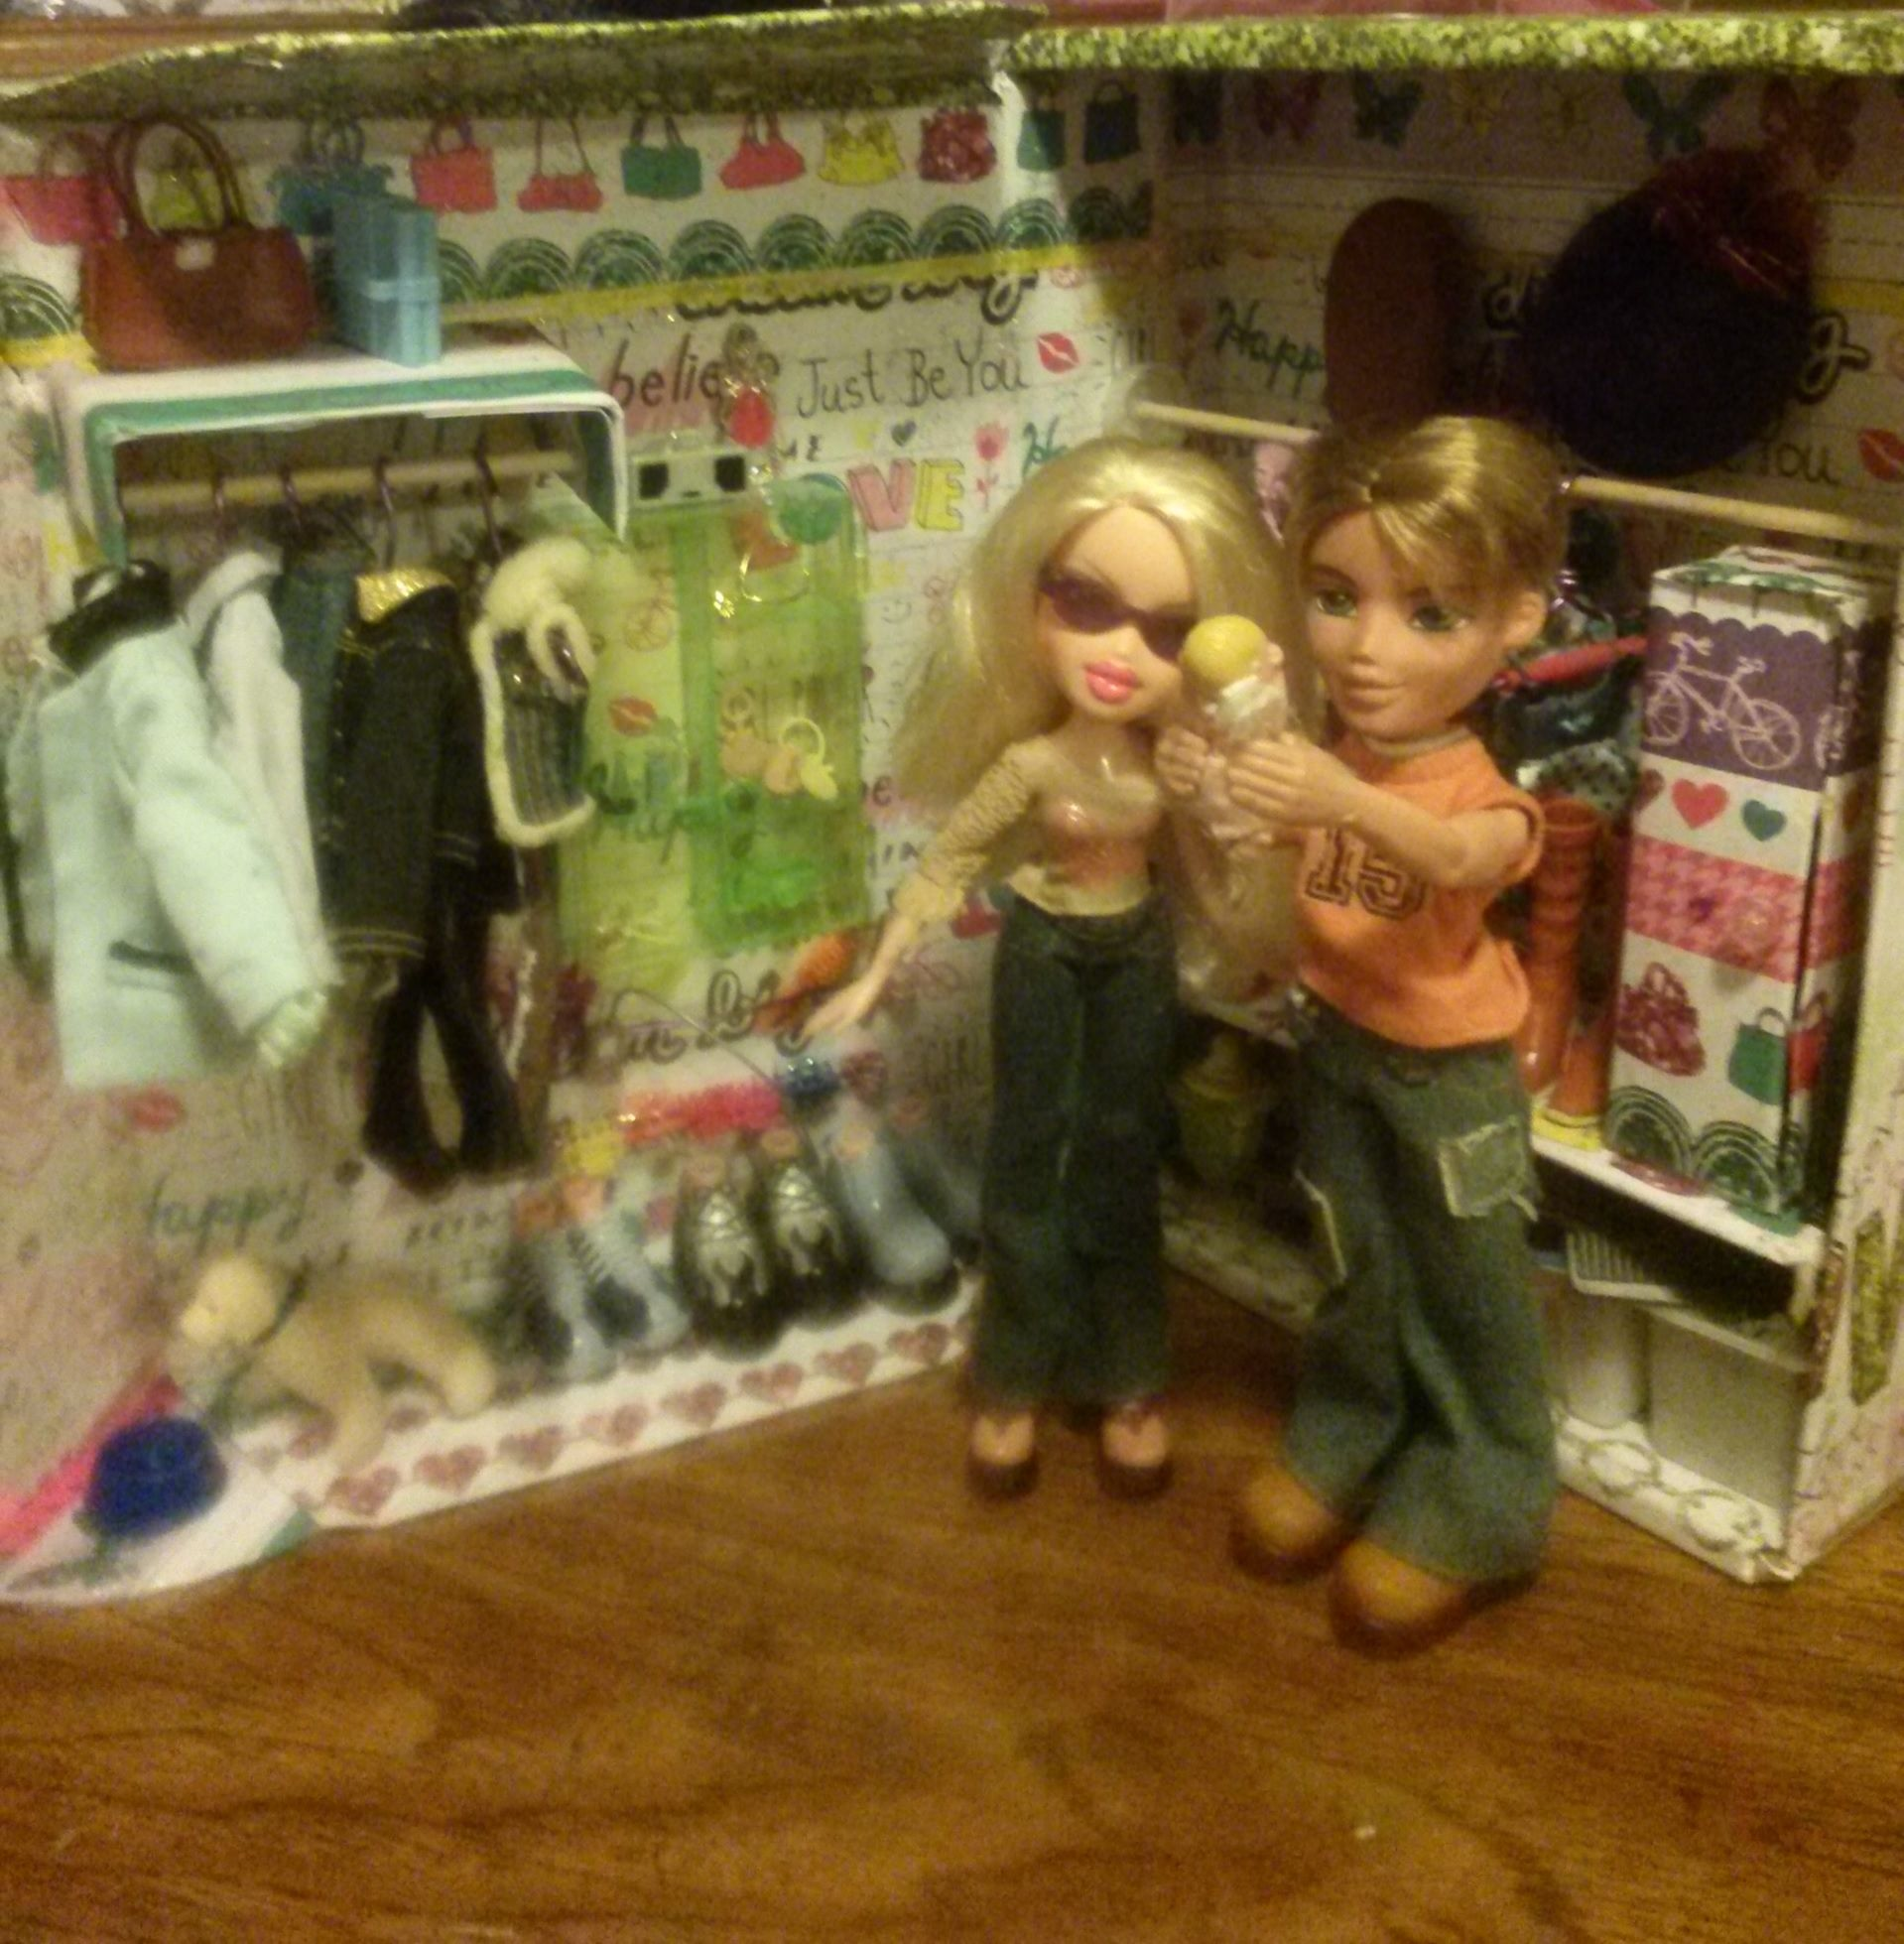 recycled closet wit bratz FEmale, male, baby & dog